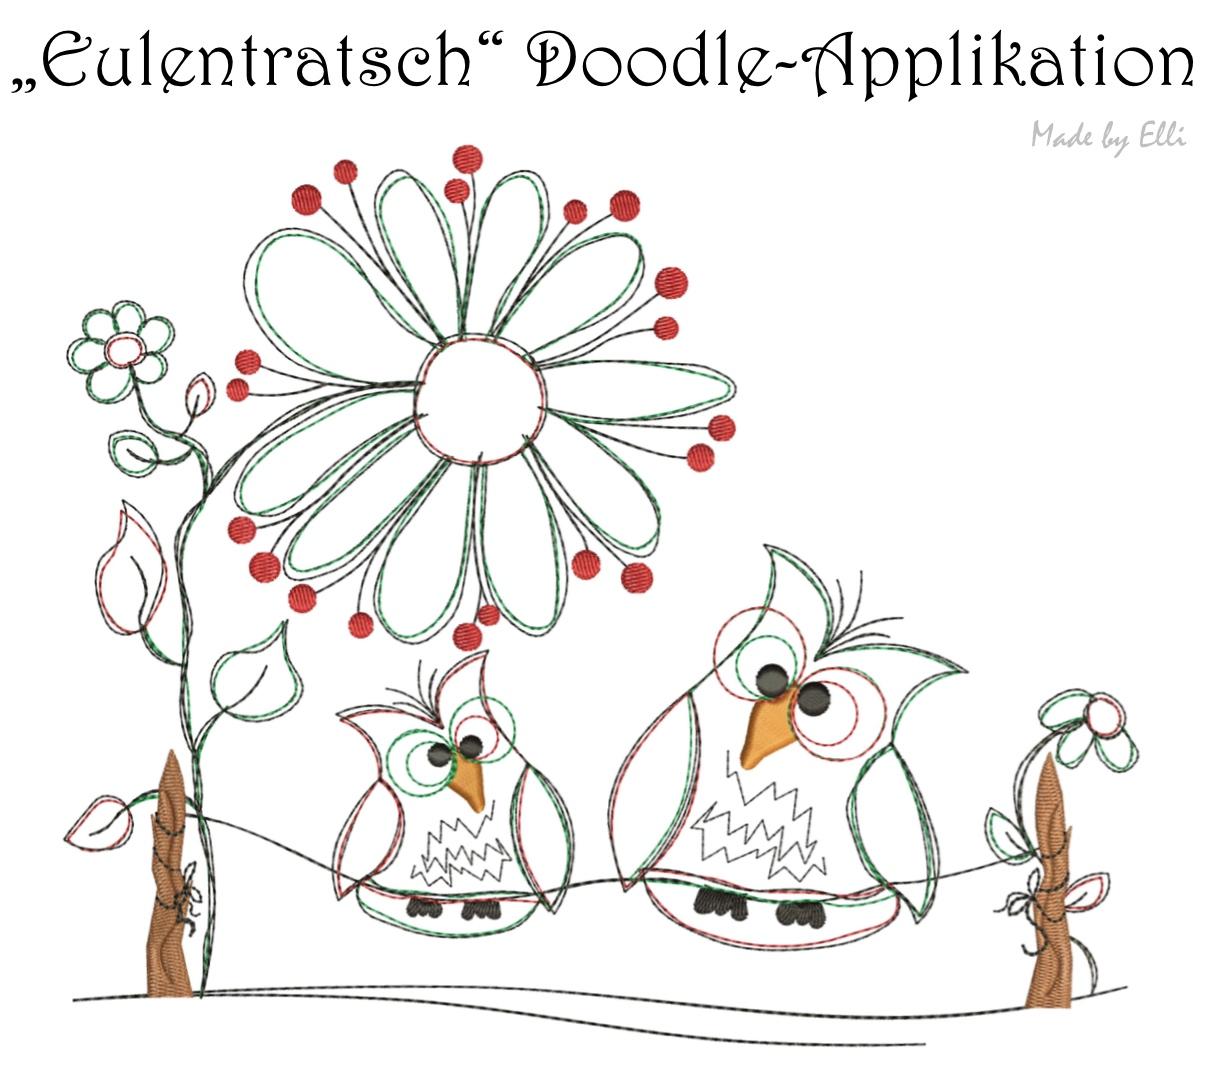 Eulentratsch - Doodle-Applikation